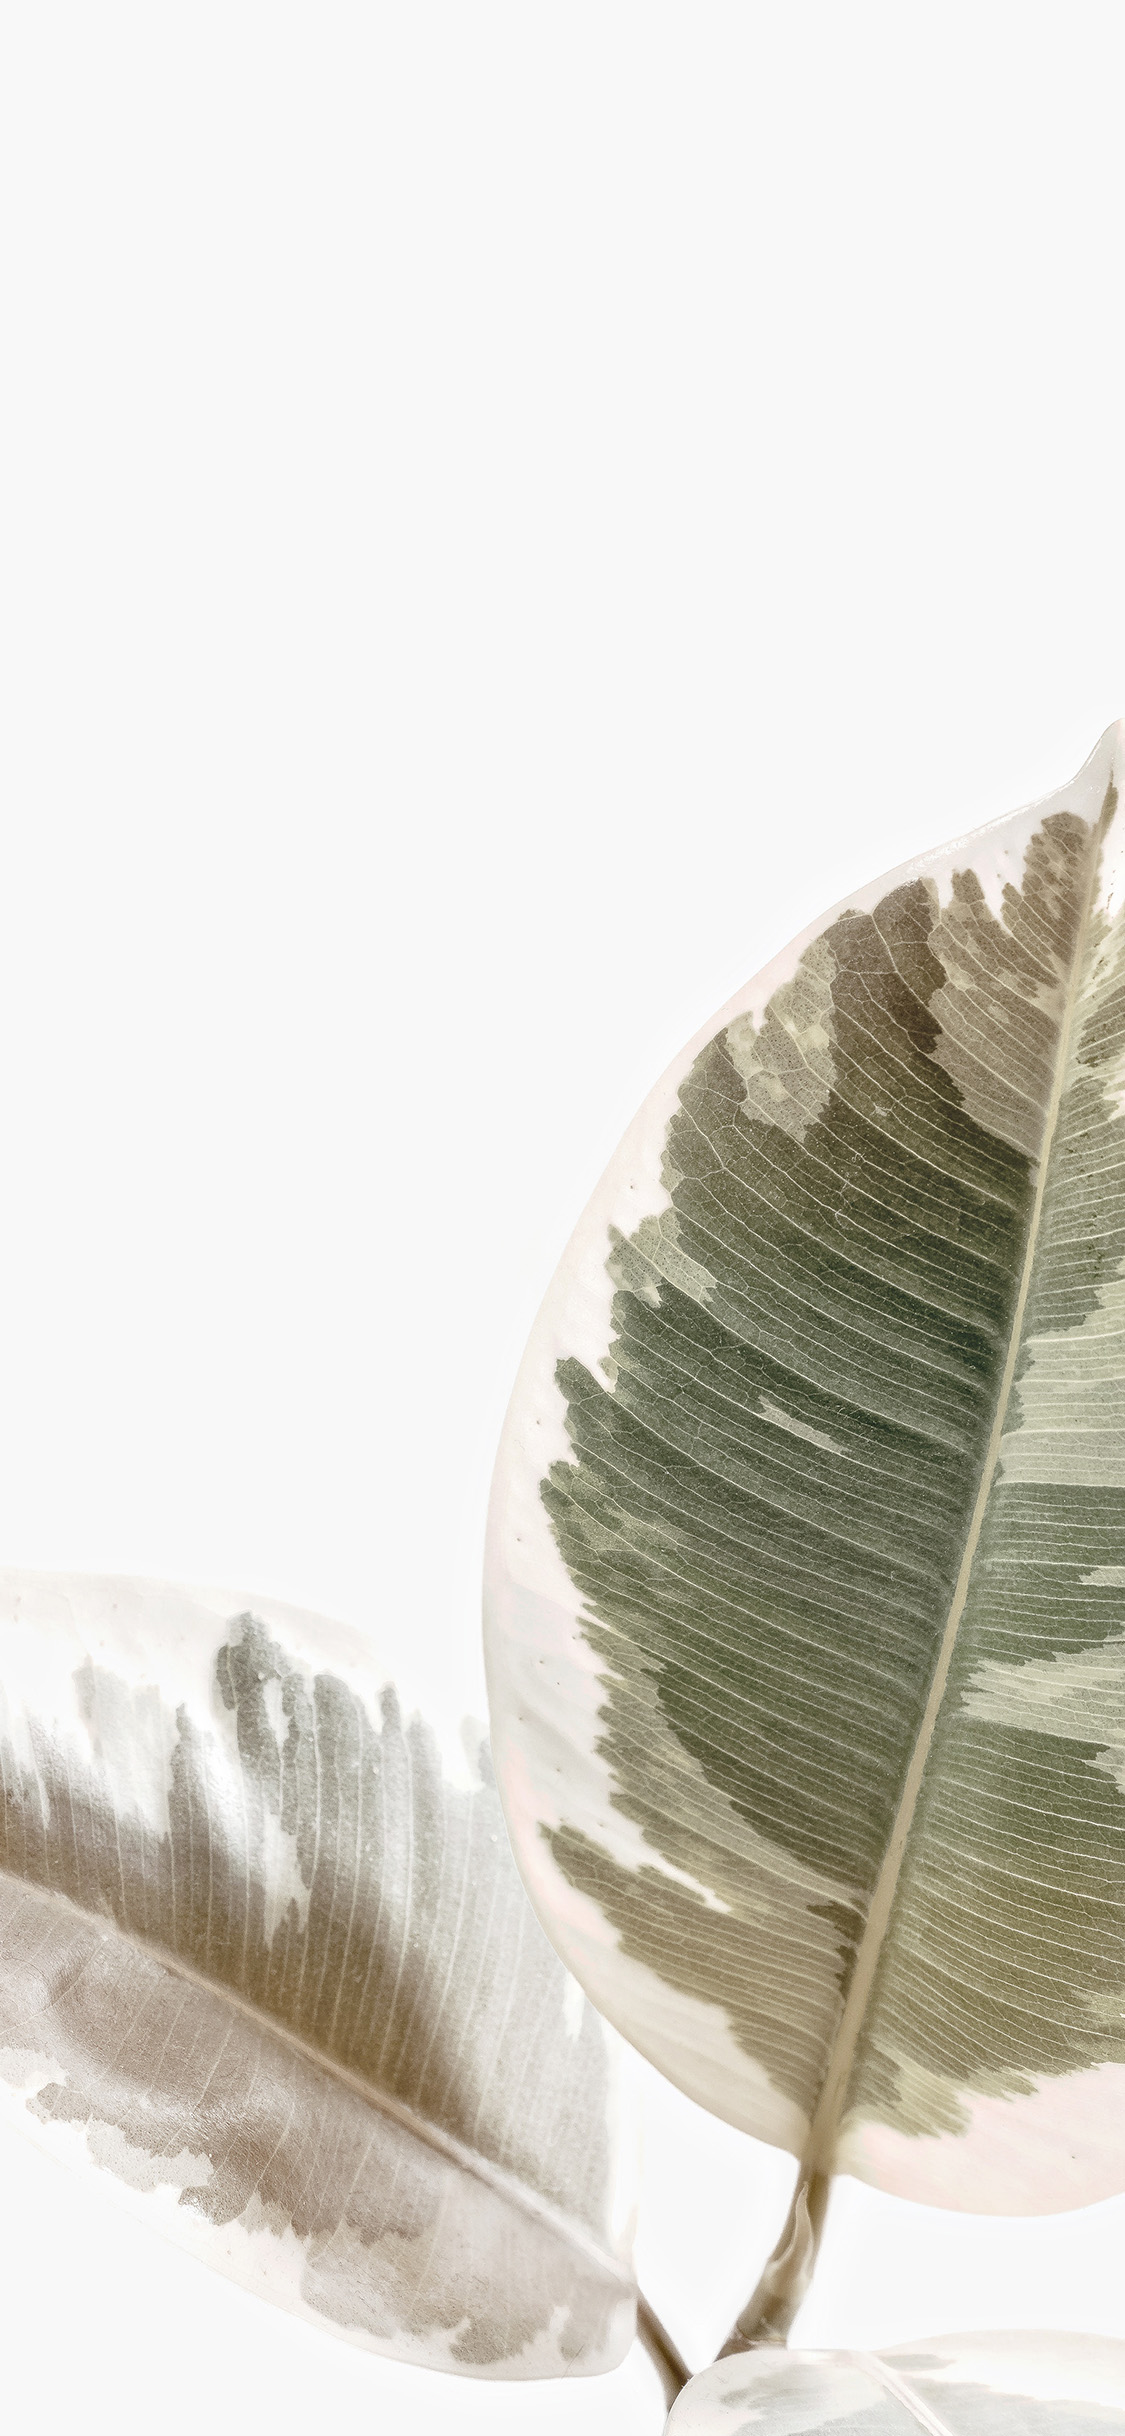 iPhonexpapers.com-Apple-iPhone-wallpaper-ob73-white-minimal-simple-leaf-nature